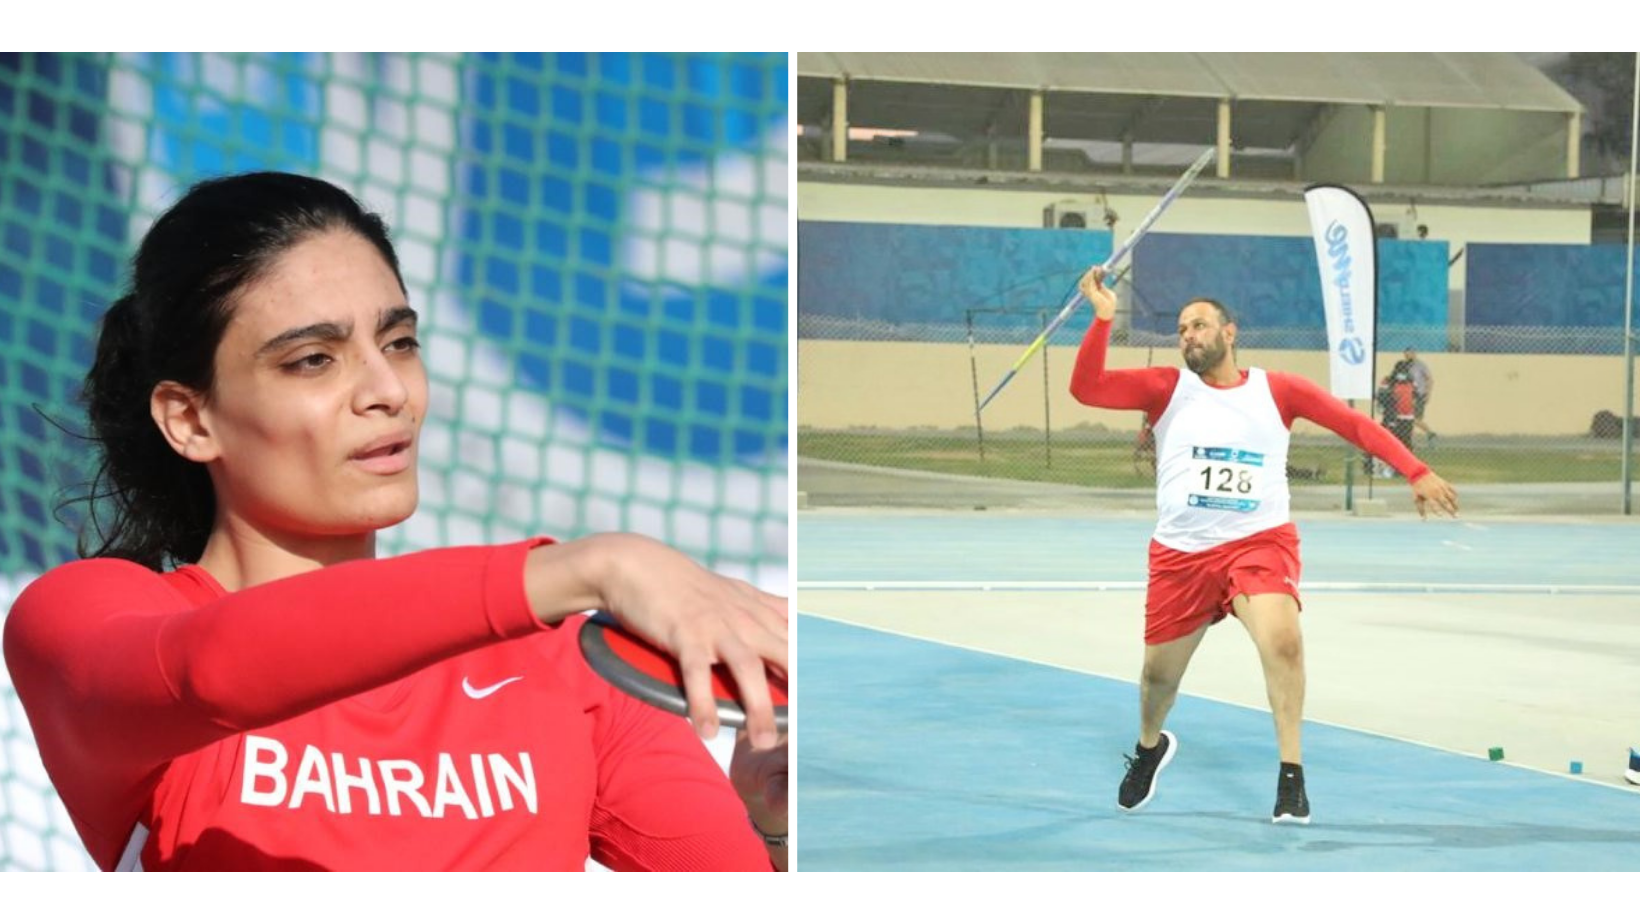 Bahraini Paralympian's stellar performance